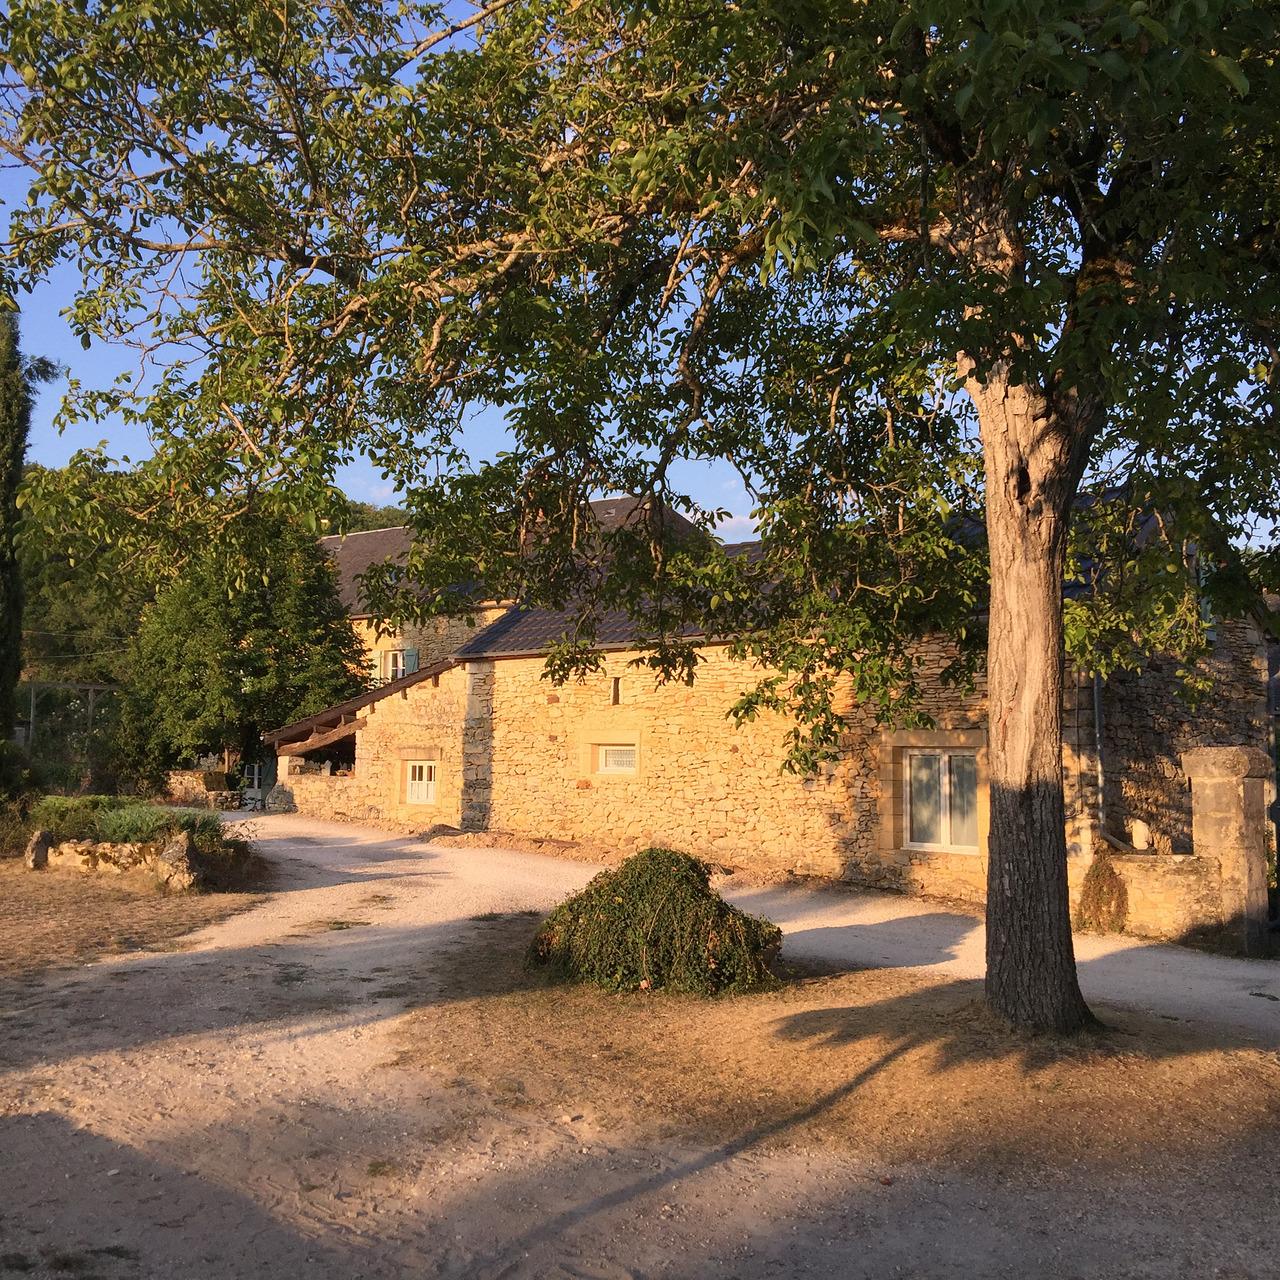 Le Domaine Des Crouquets Prices Specialty Inn Reviews